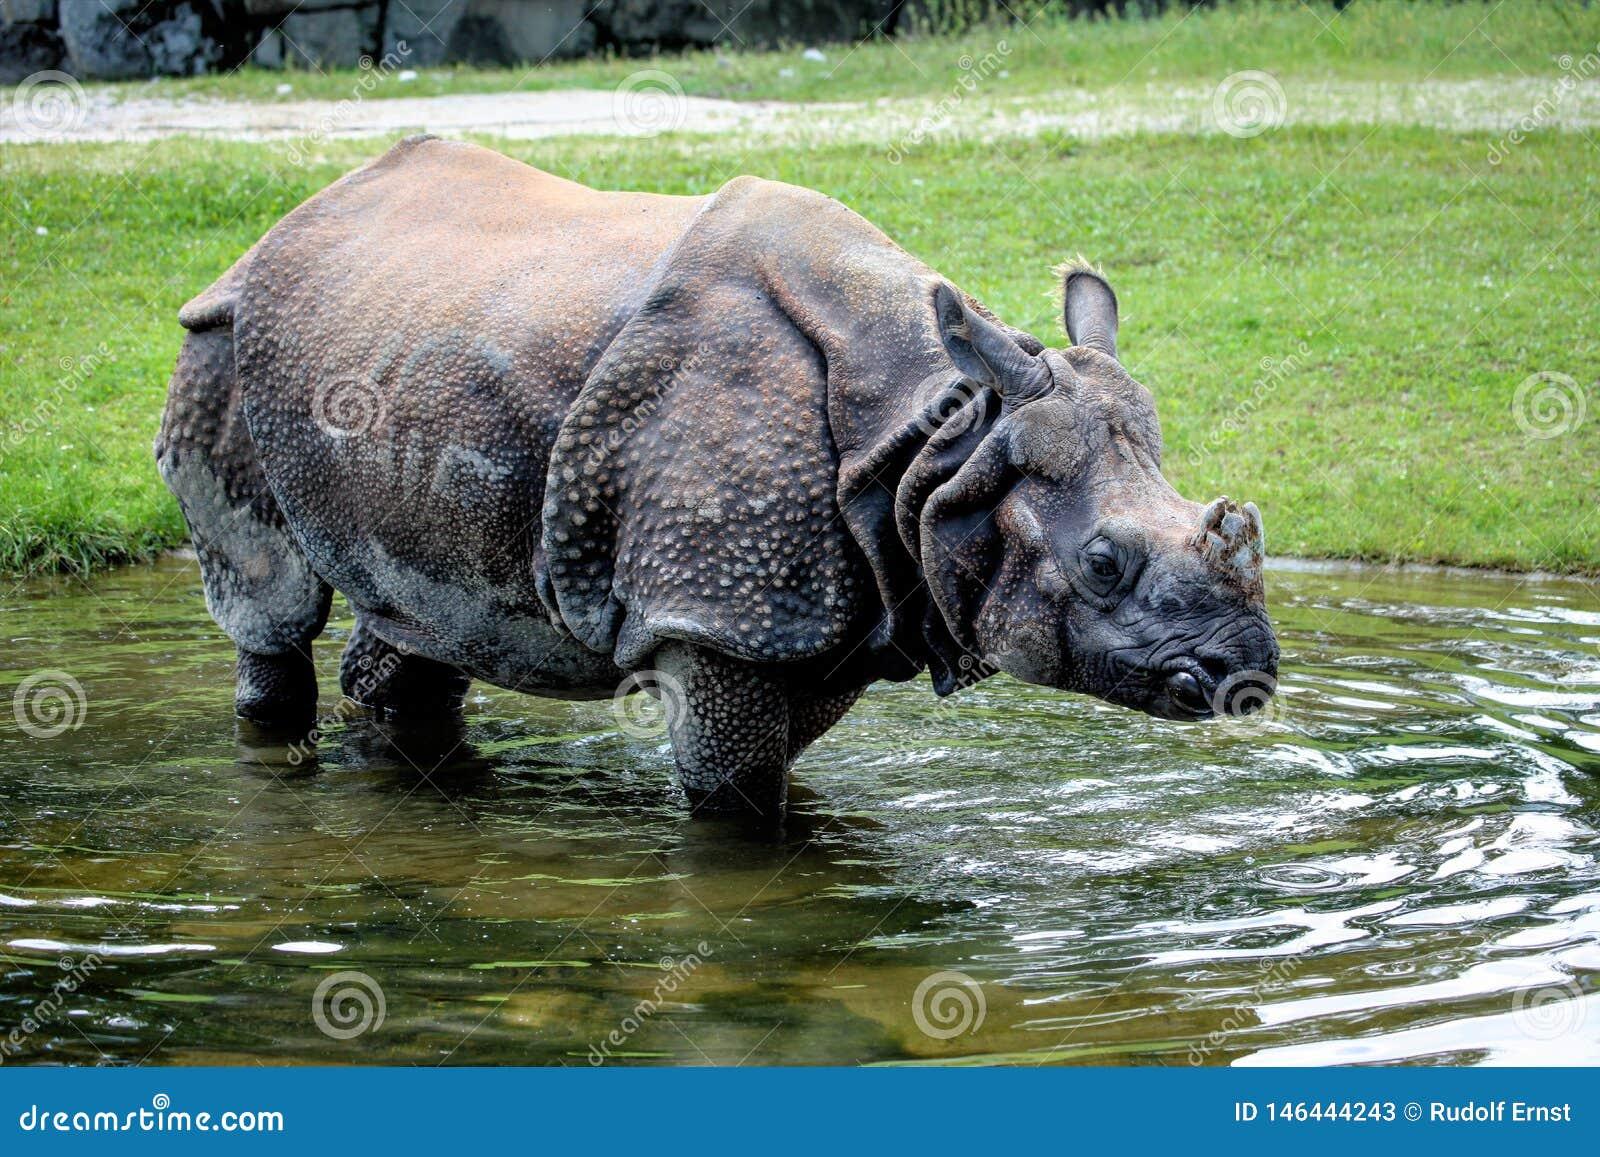 Asian one horned rhino